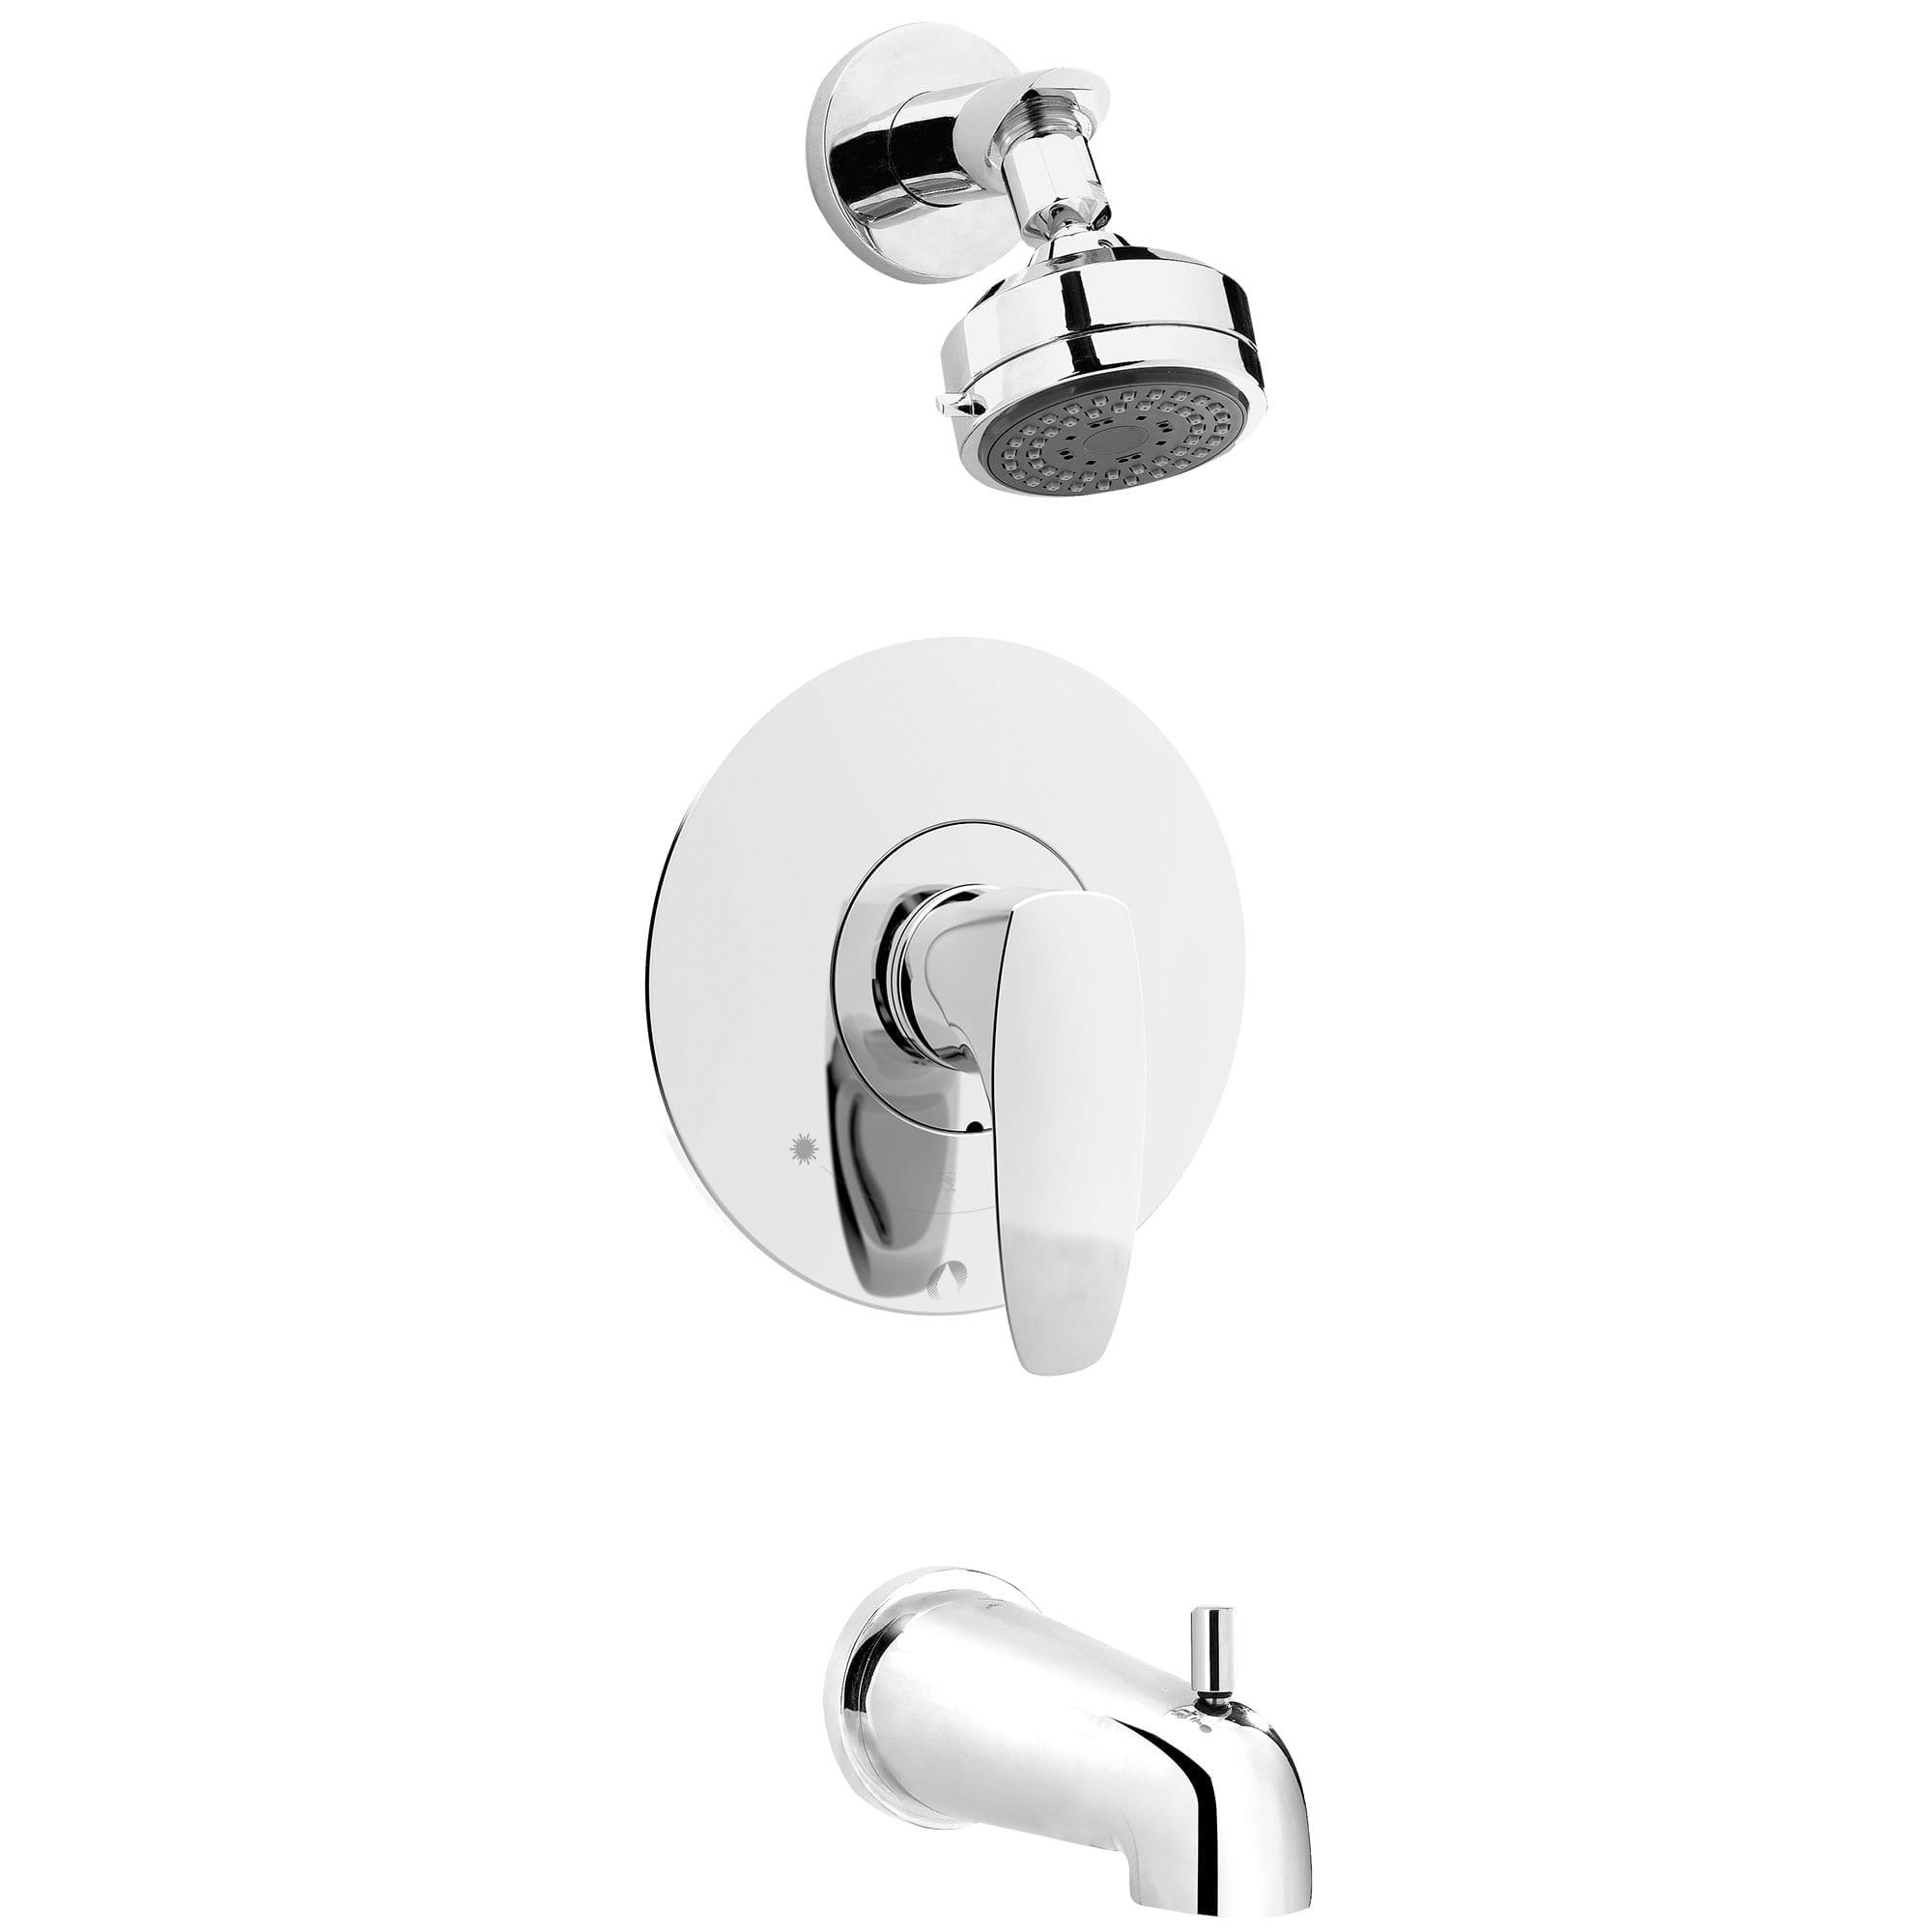 Bathtub Shower Faucet Trim For Pressure Balanced Valve With